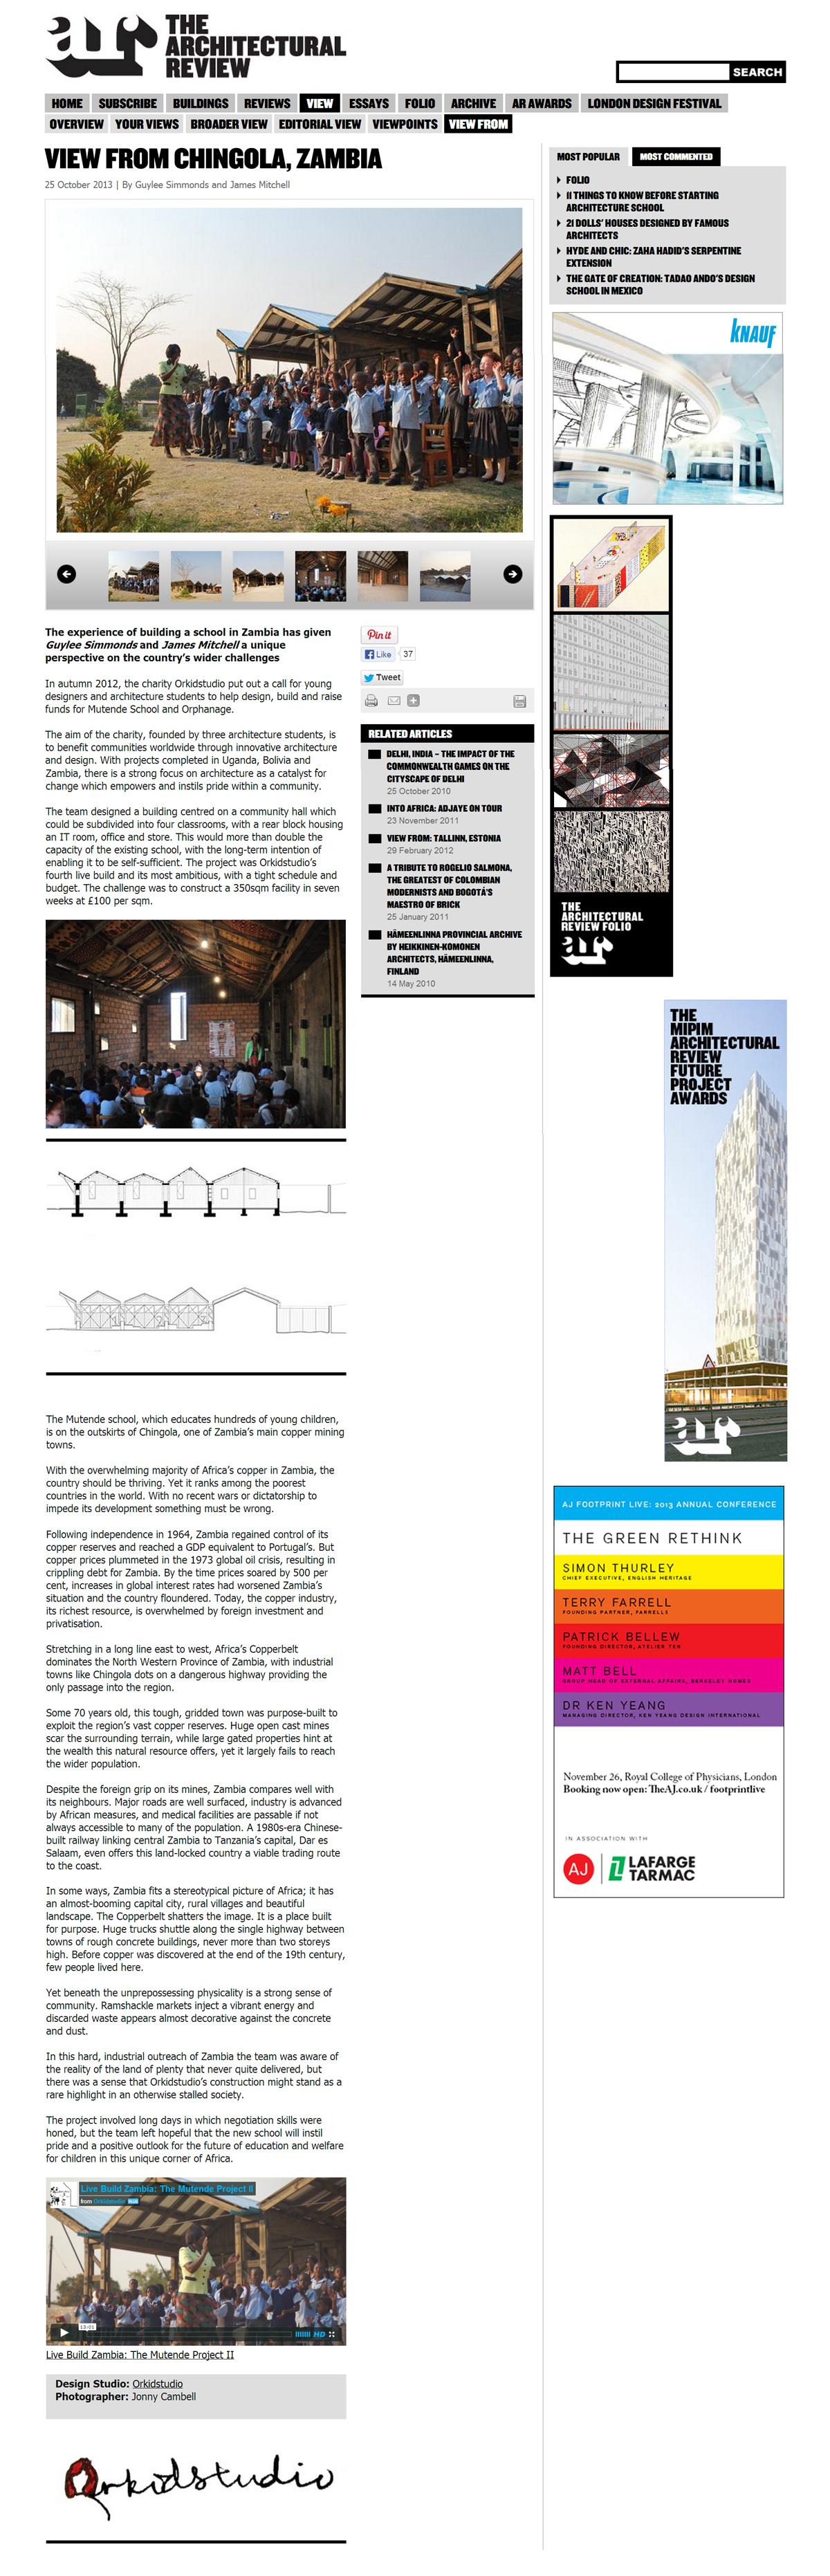 Architectural Review - Mutende, Zambia